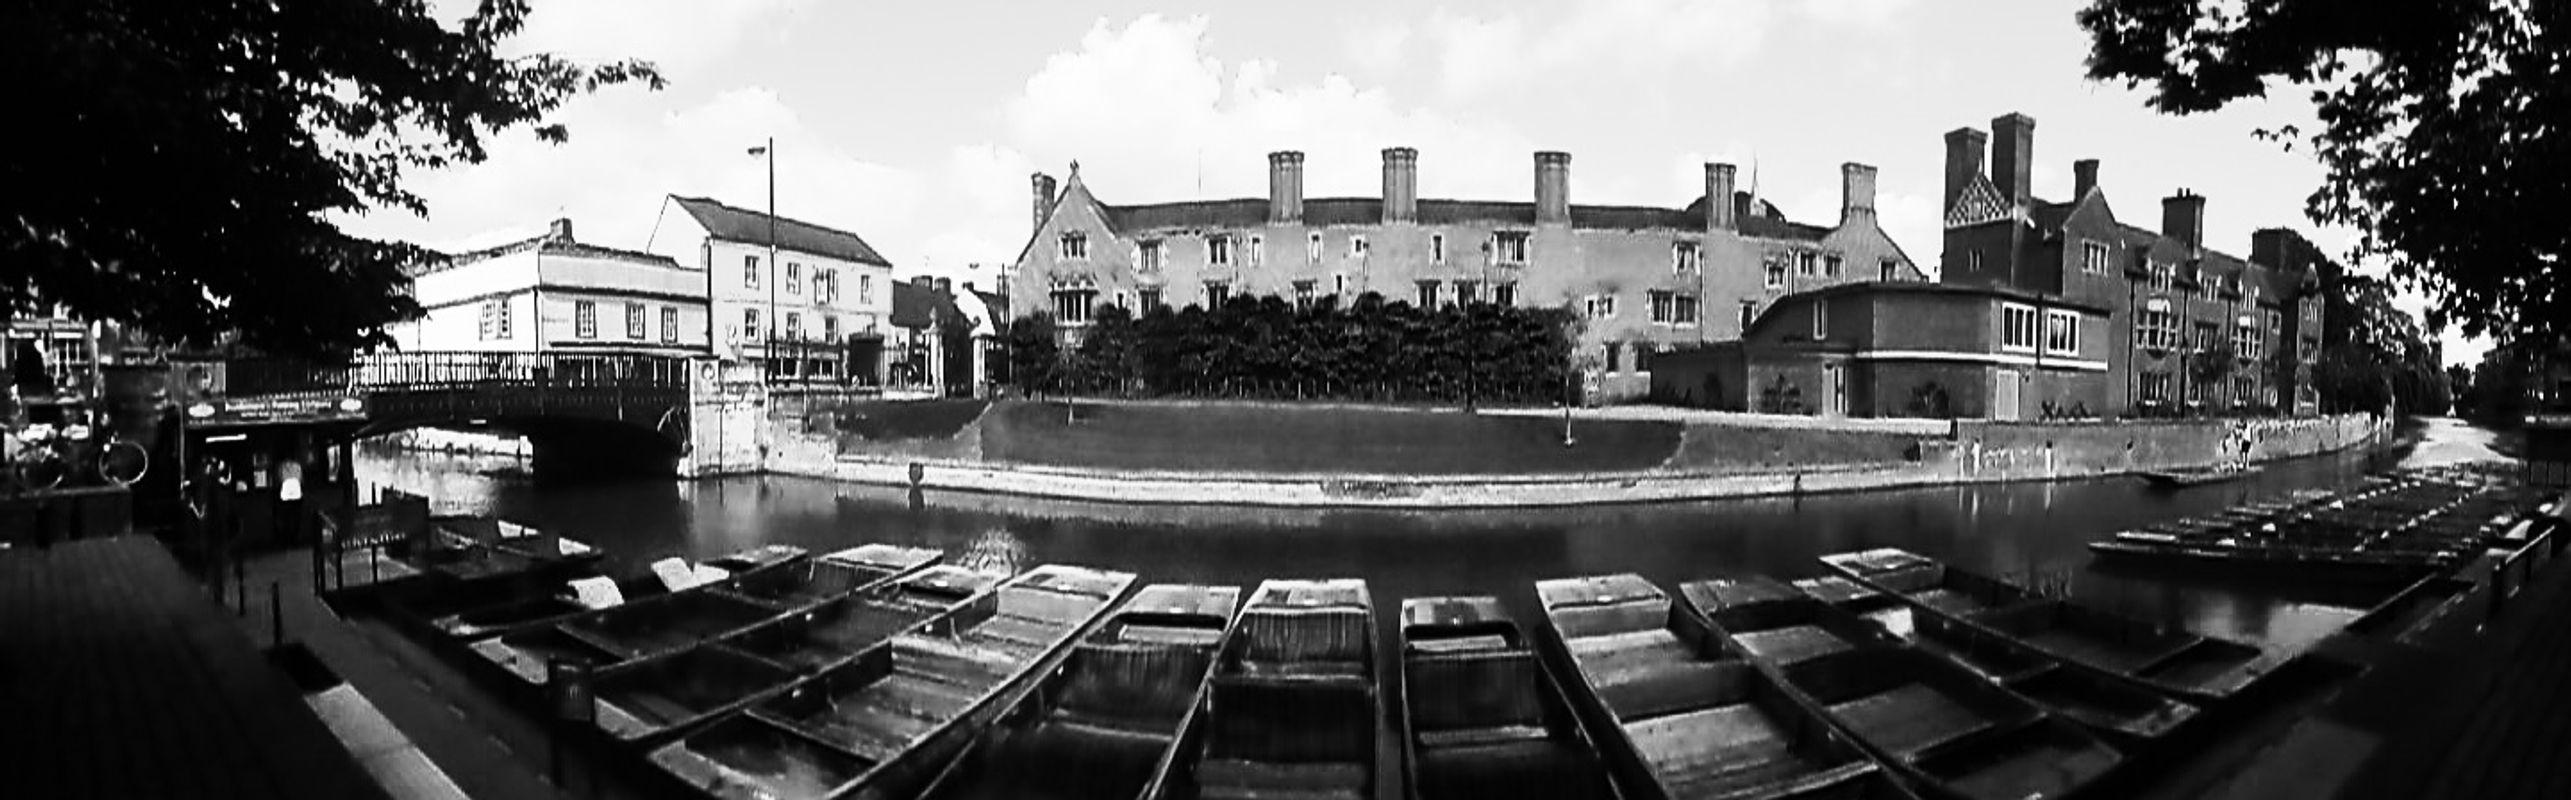 BW Panoramic Cambridge in England.